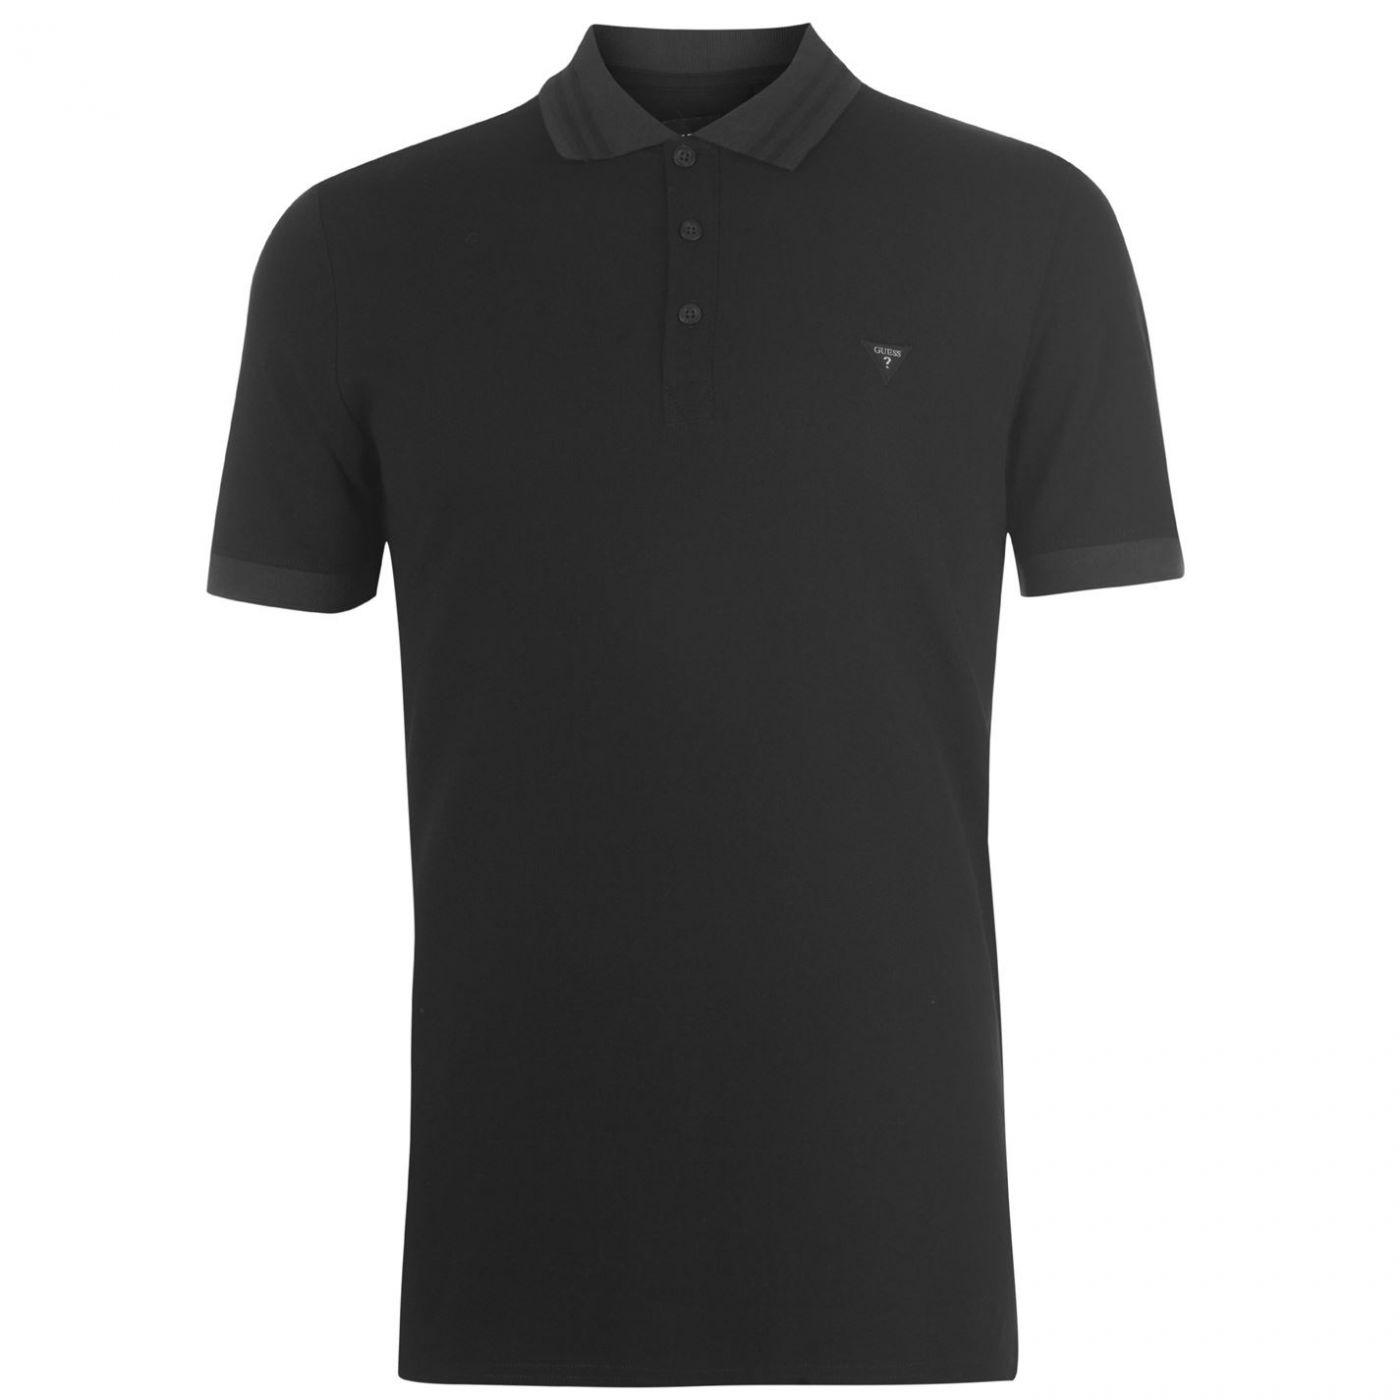 Guess Cullen Polo Shirt